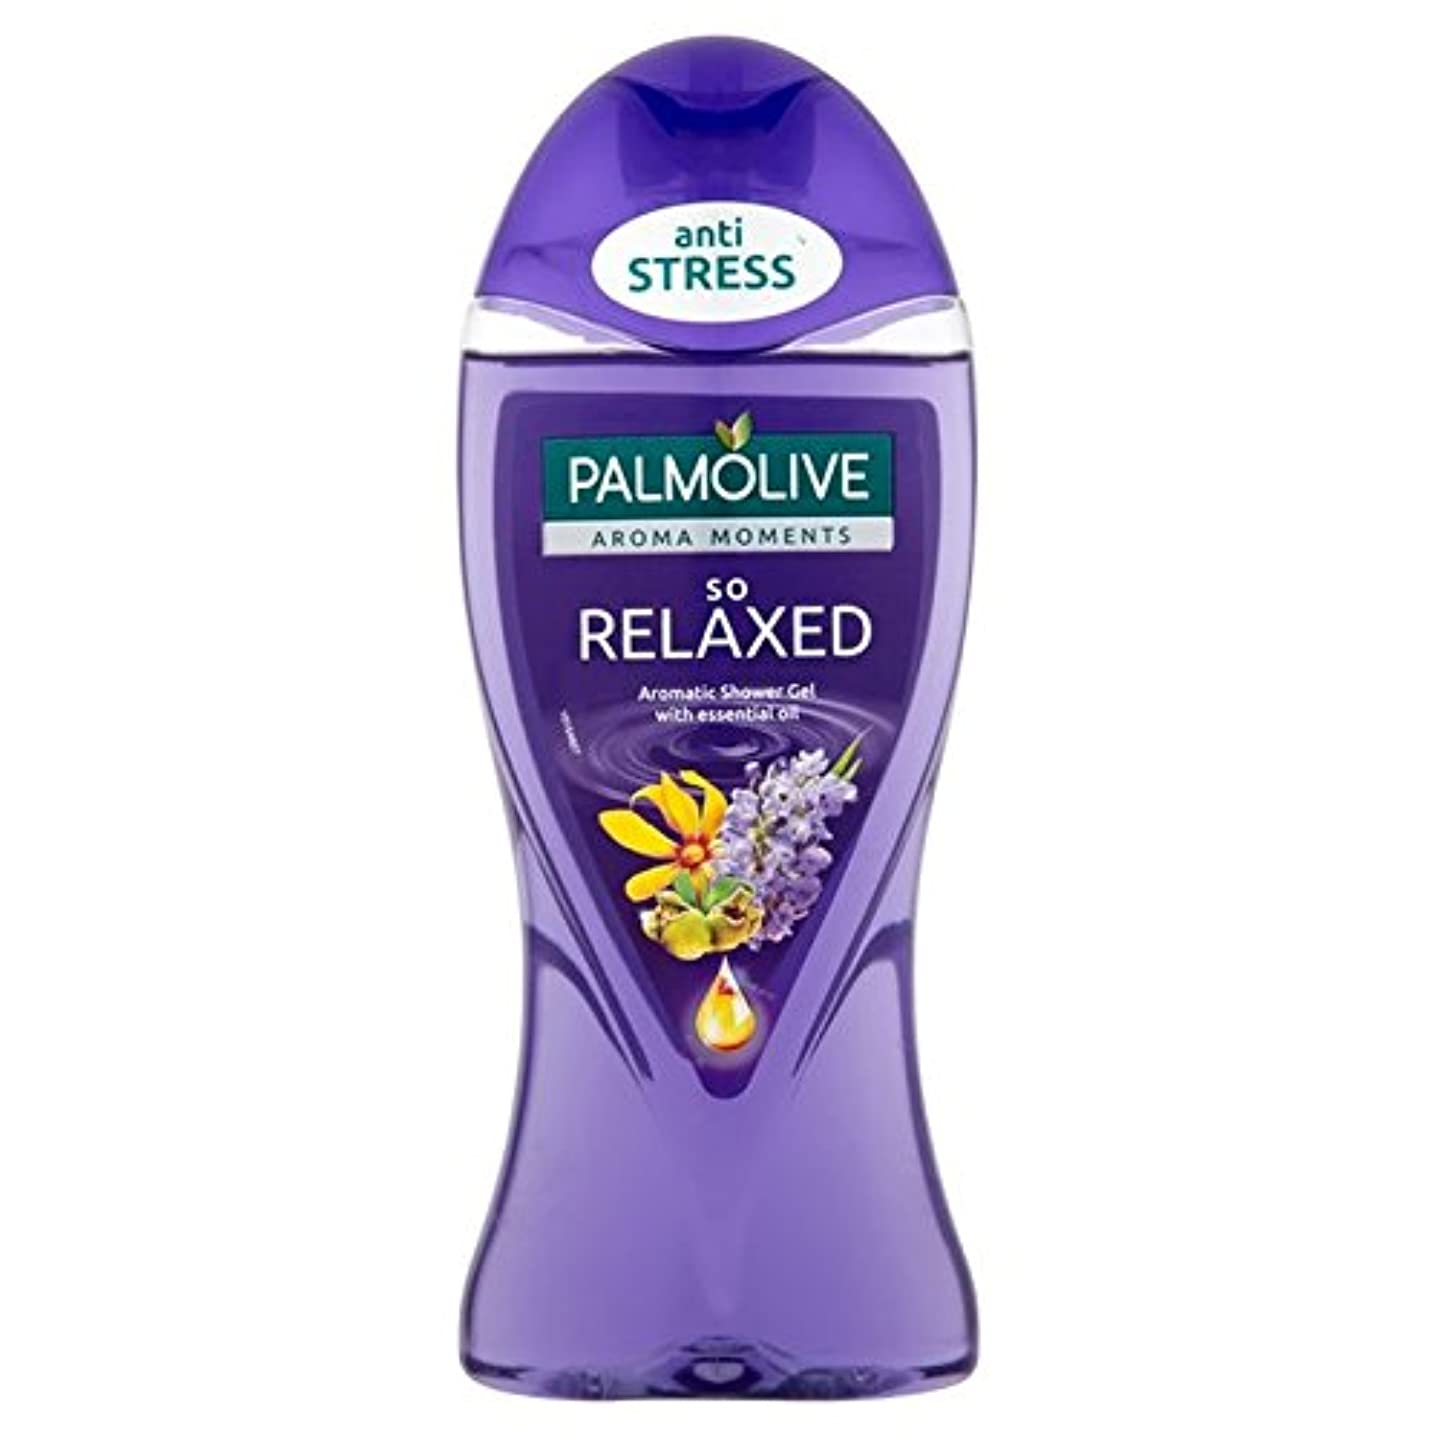 Palmolive Shower Gel Relaxed 250ml - パルモシャワージェルリラックスした250ミリリットル [並行輸入品]